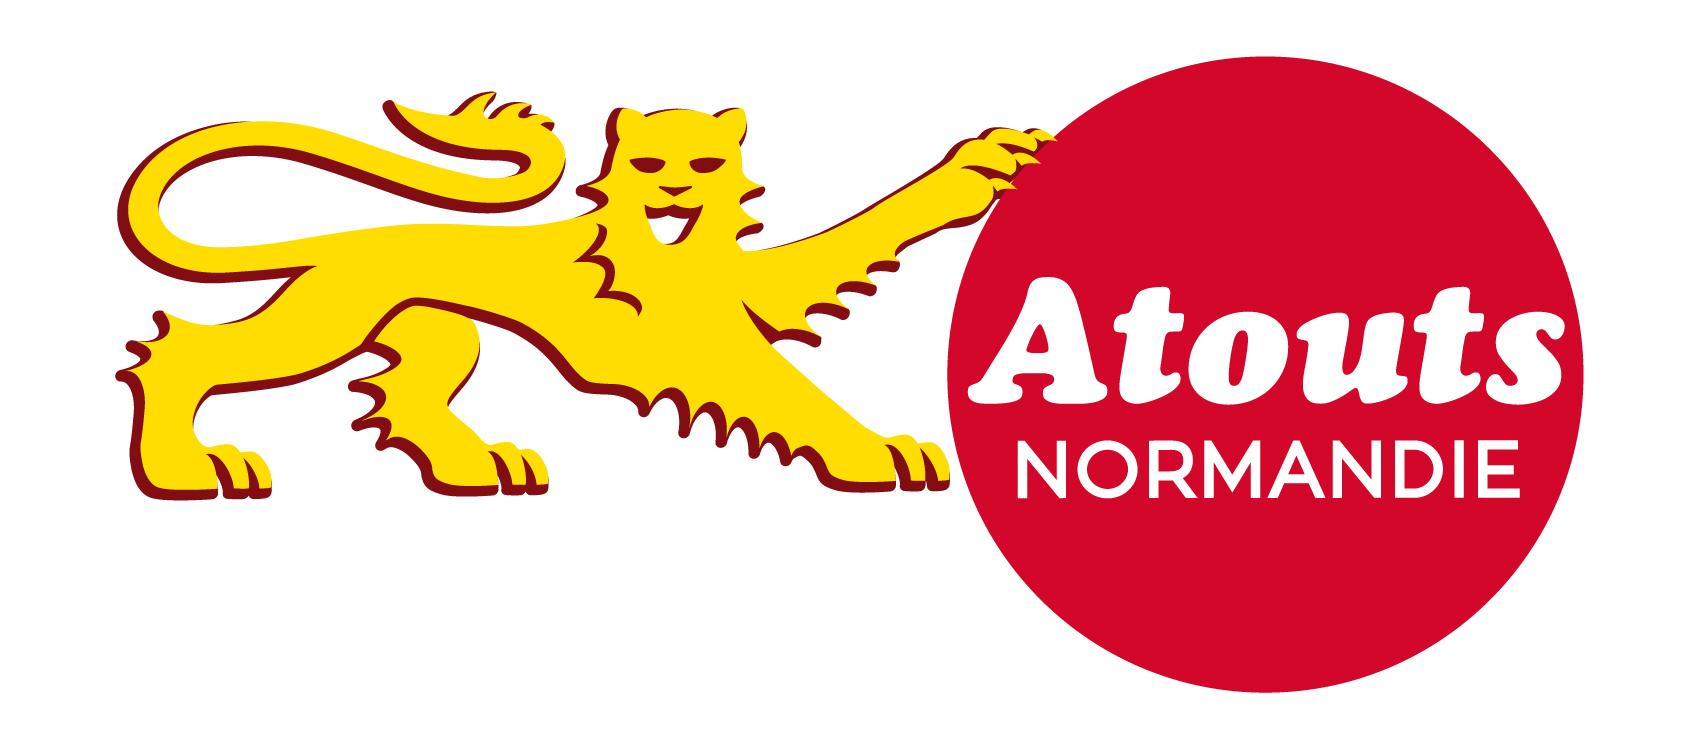 Atouts normandie